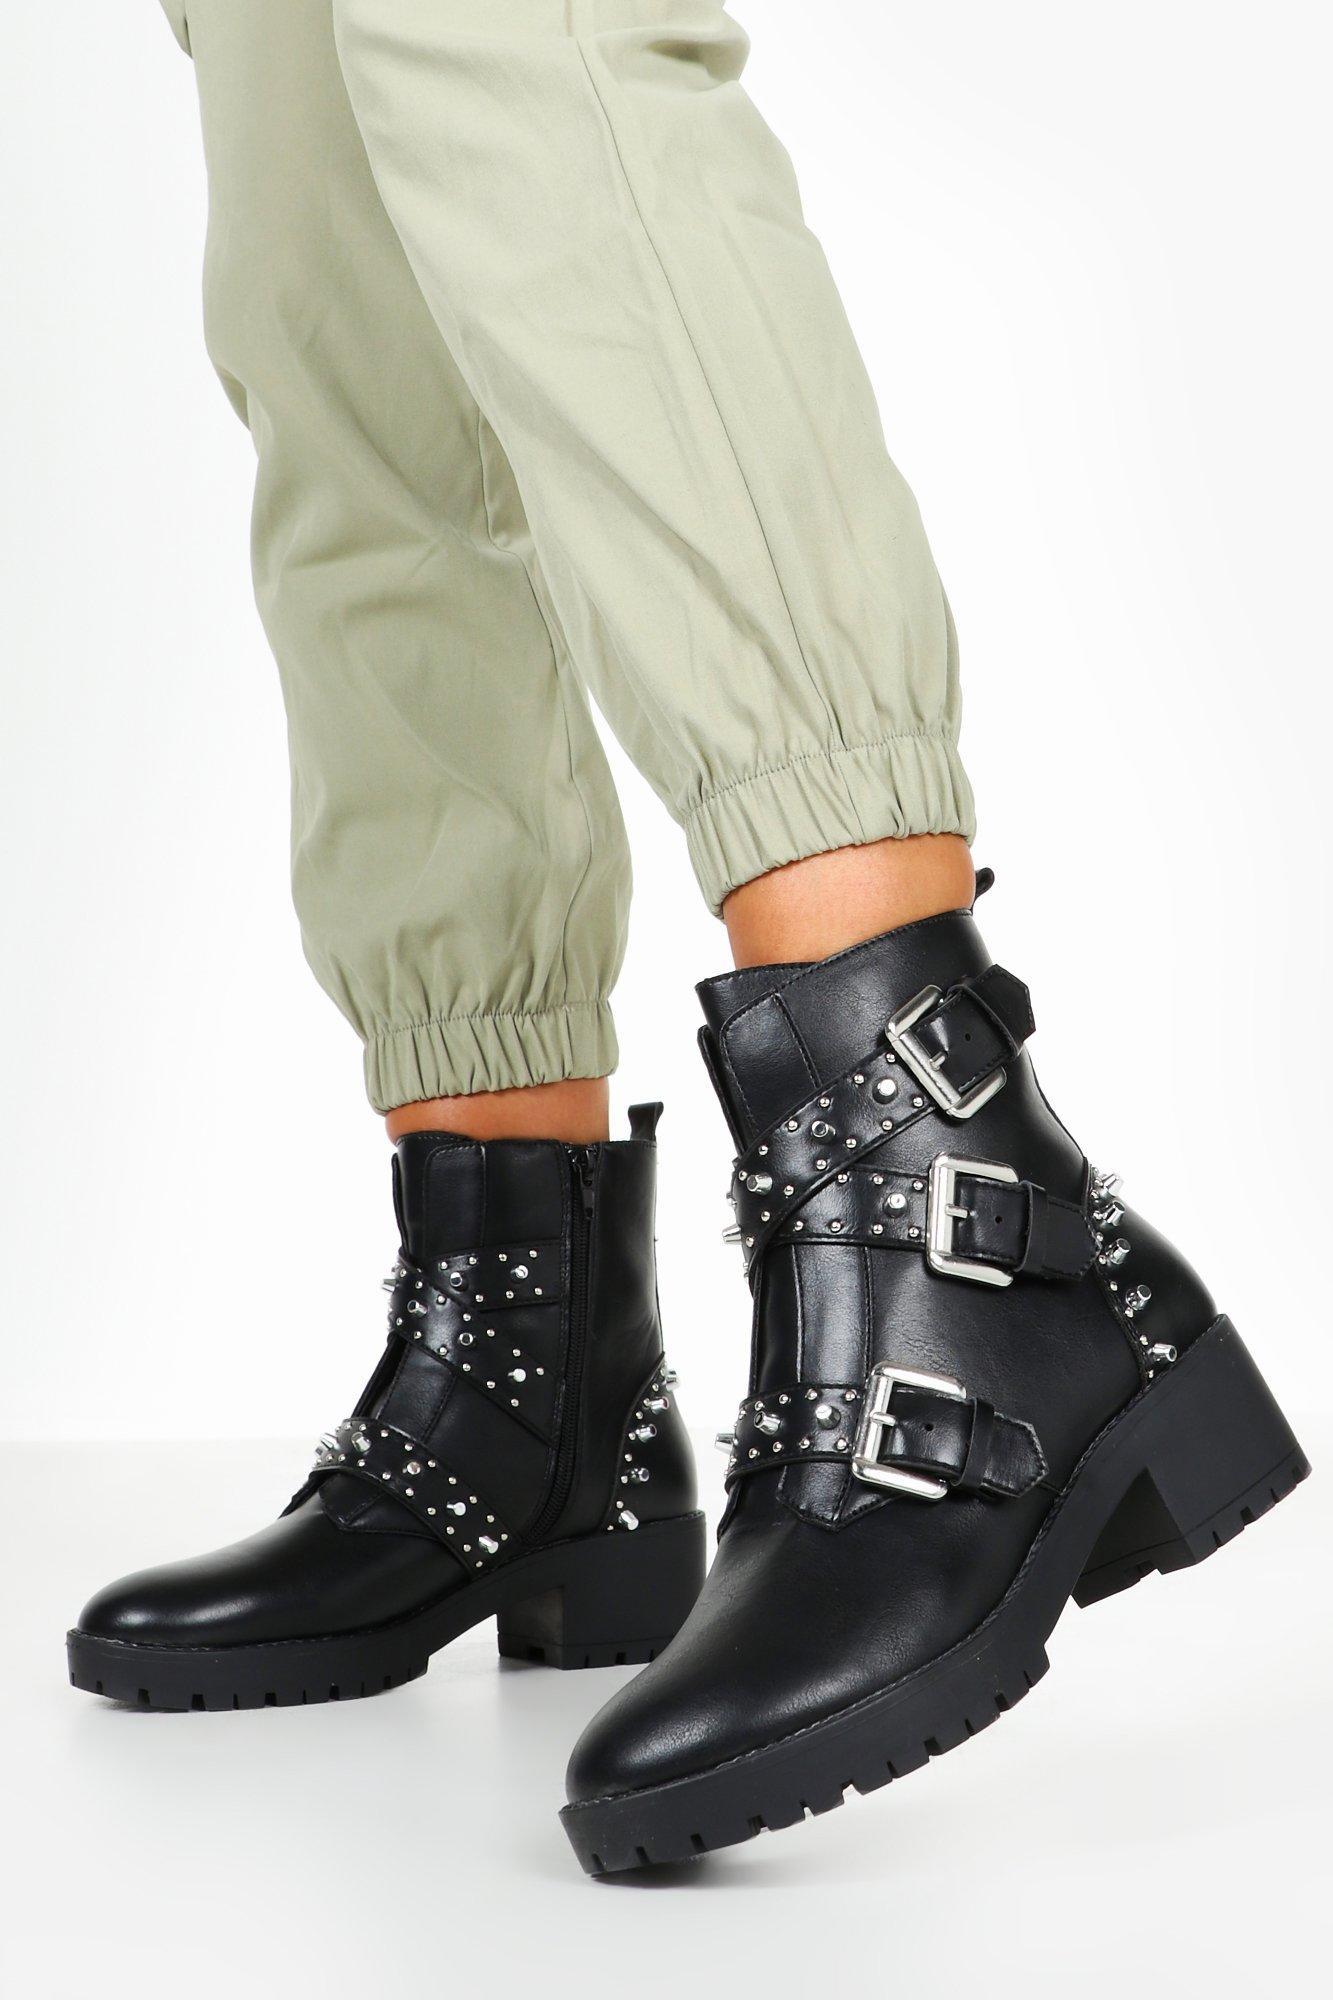 boohoo Womens Studded Chunky Hiker Boots - Black - 6, Black